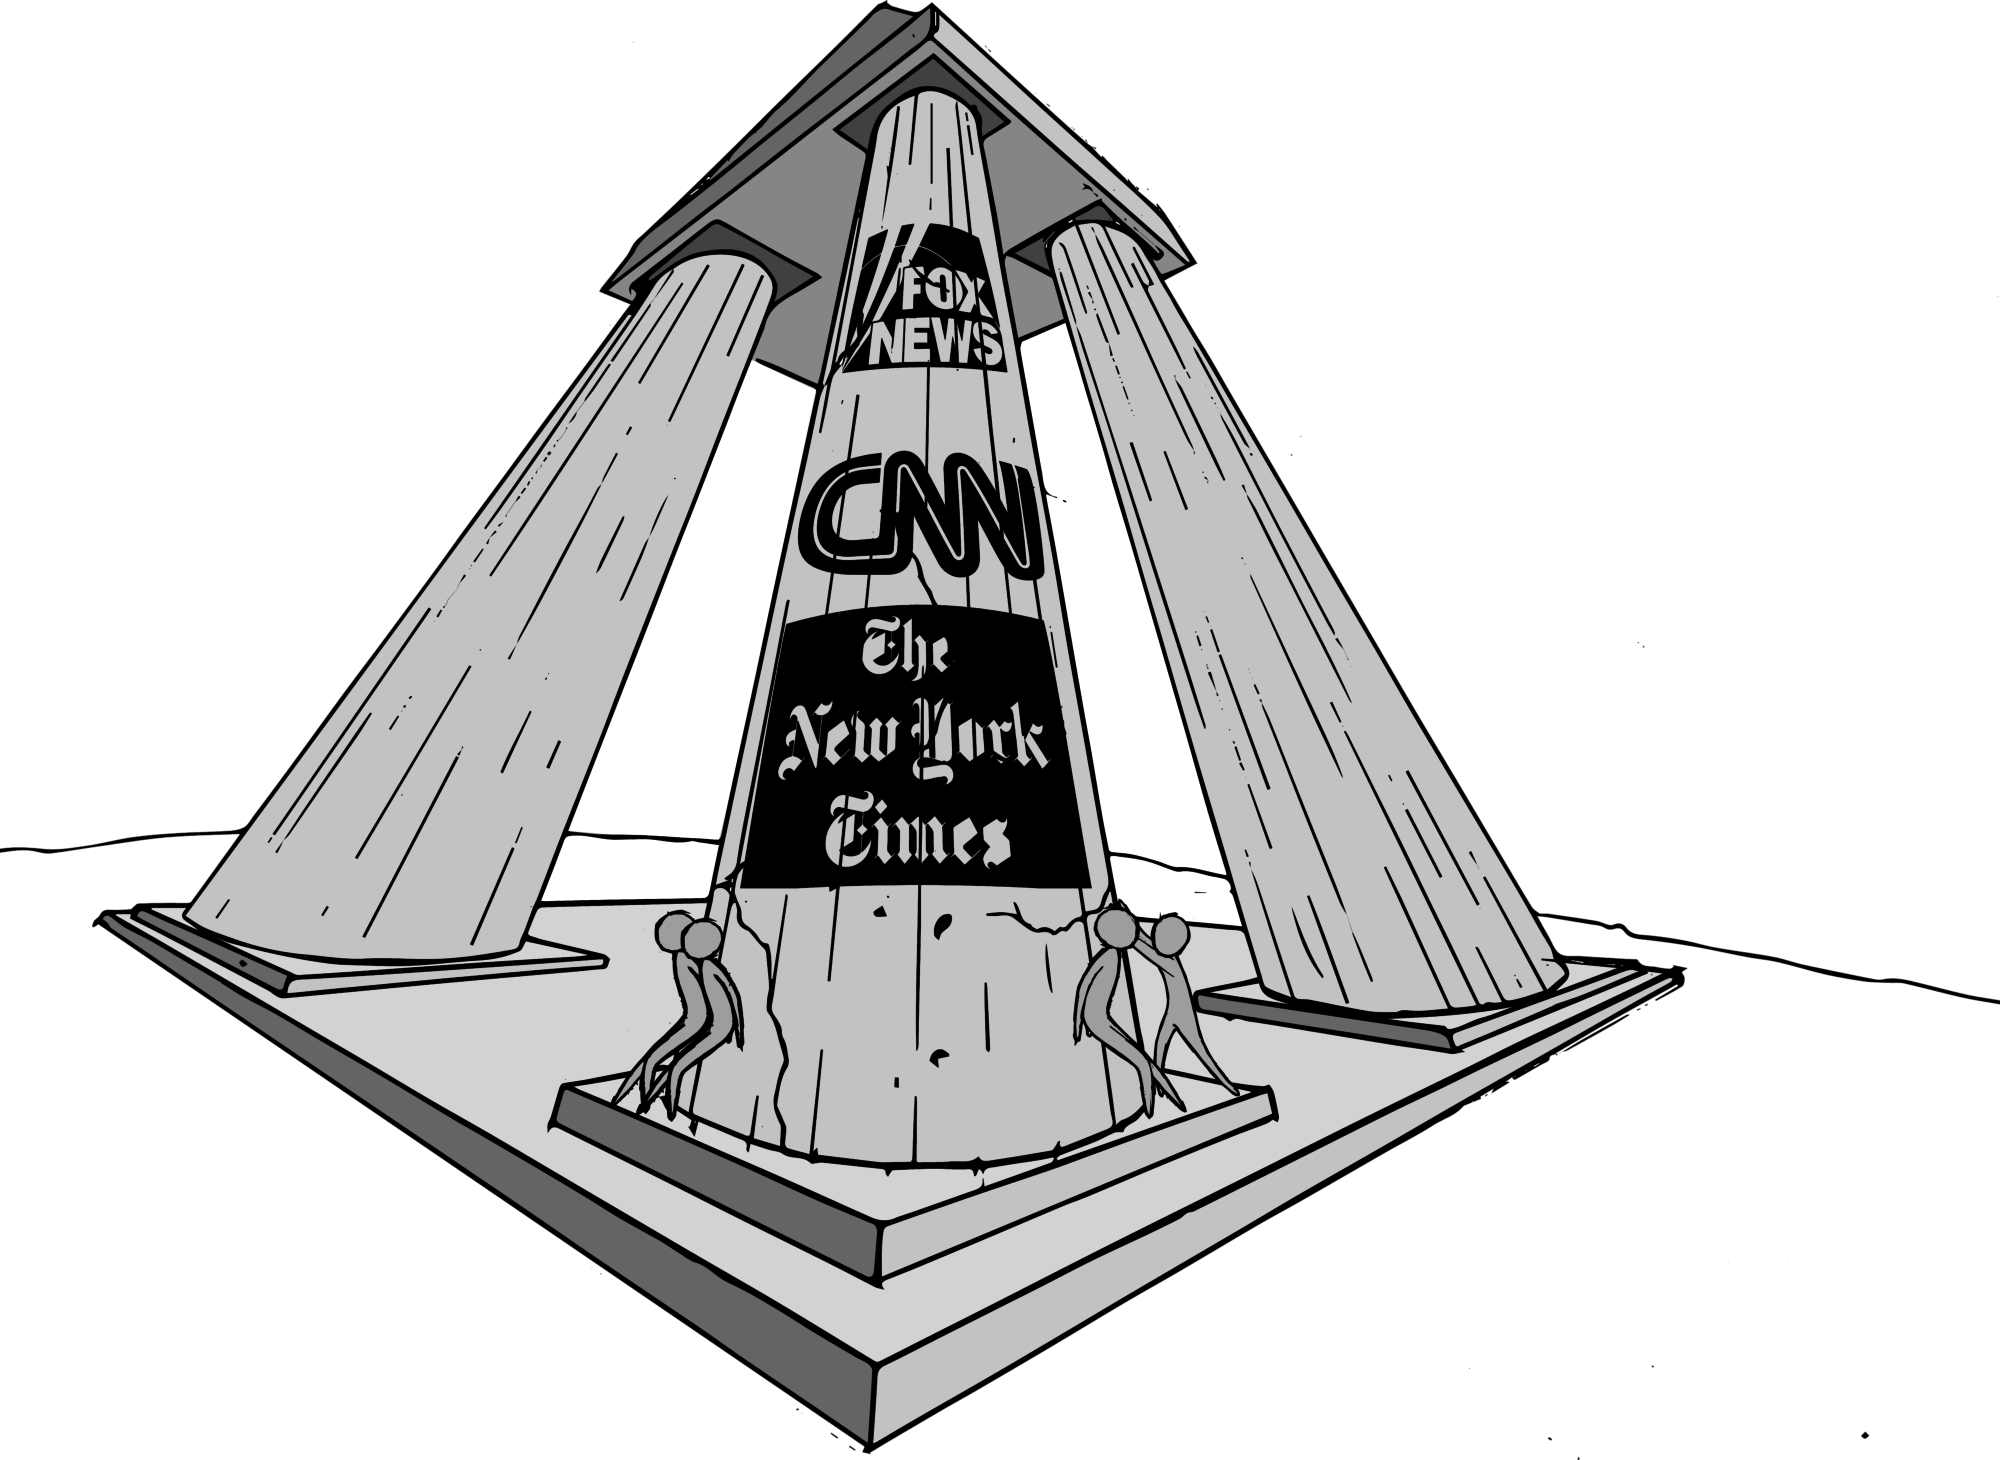 Editorial: Media plays a vital role in democracy